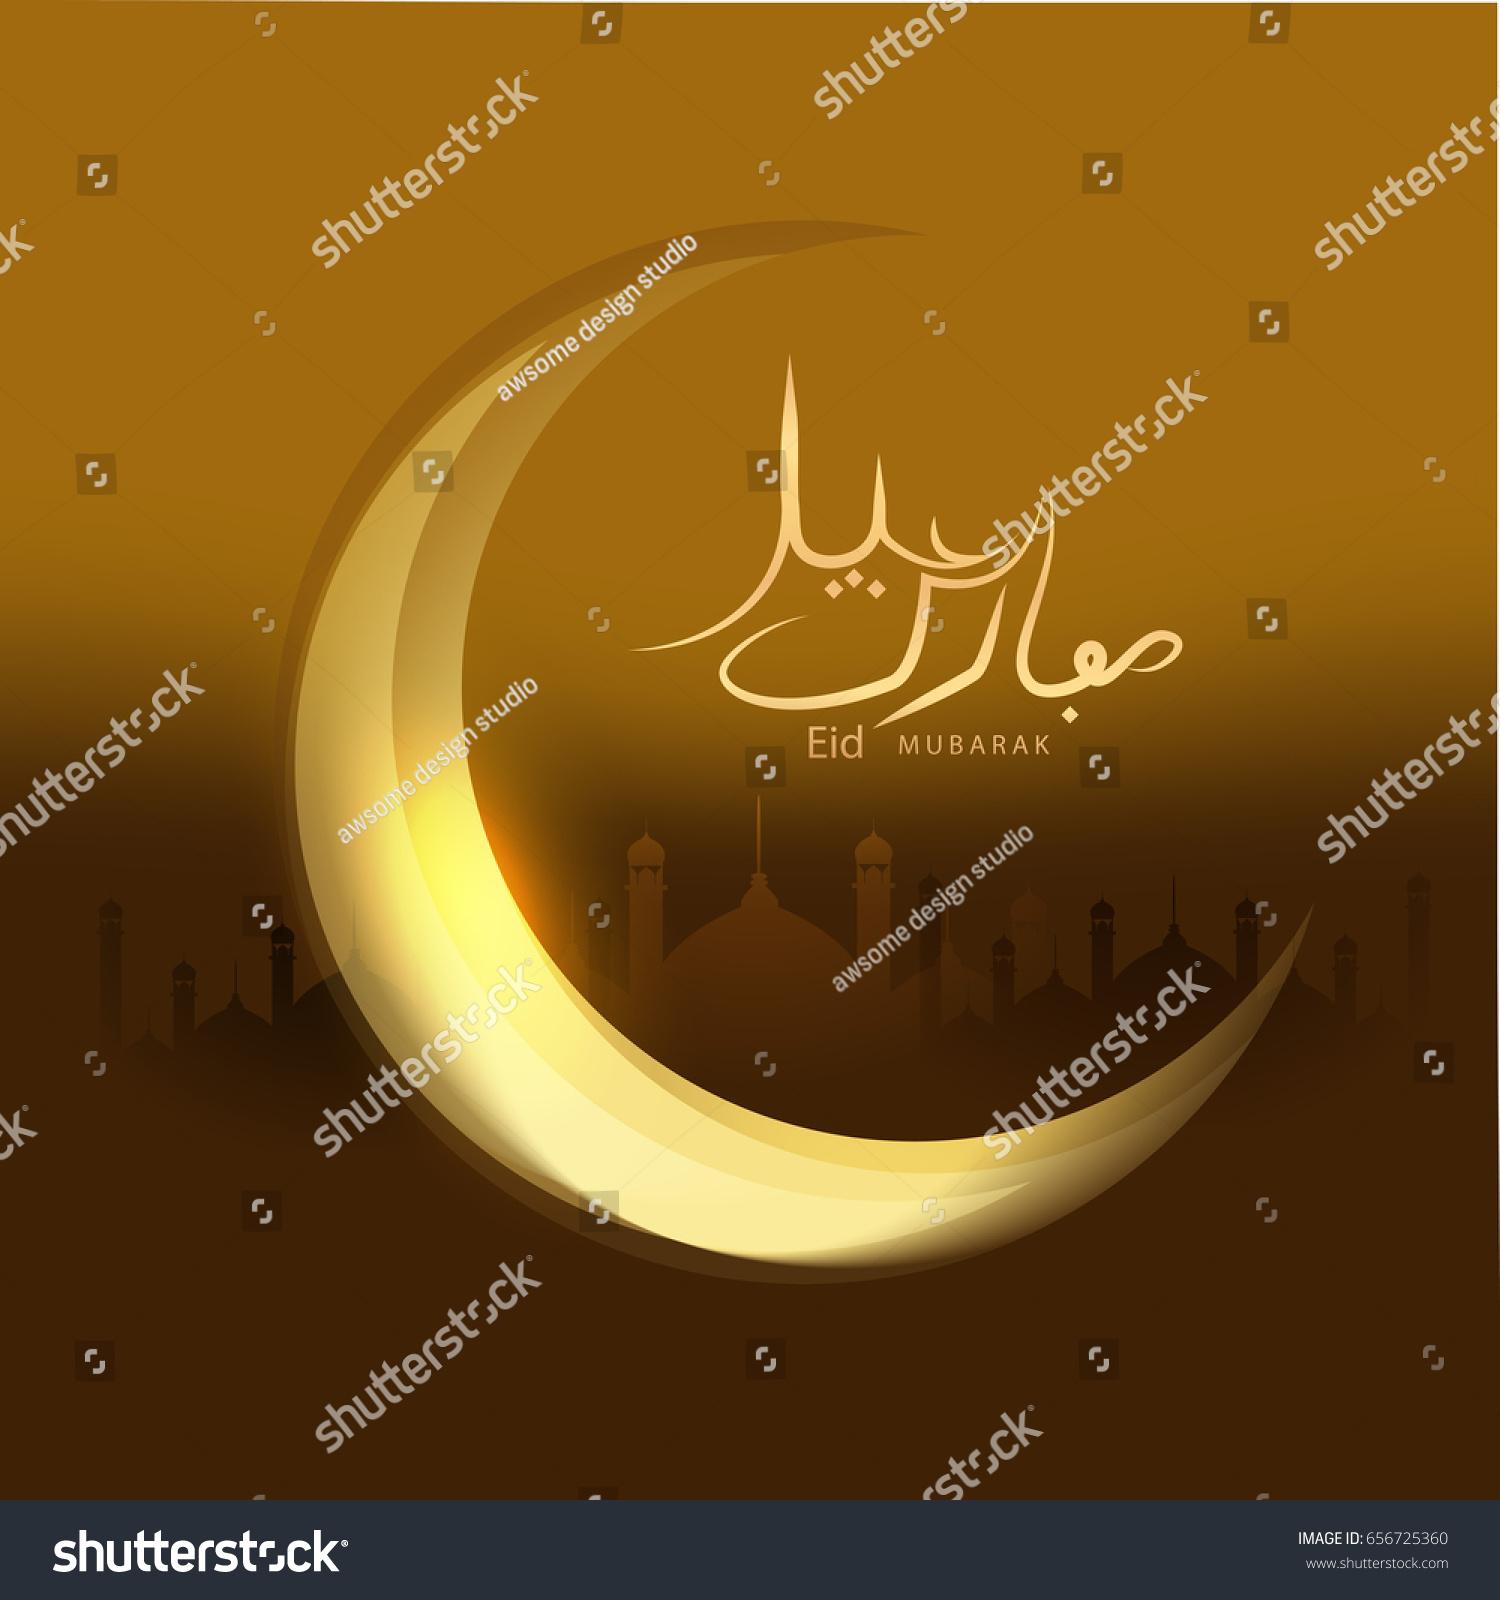 Eid mubarak greeting card design glowing stock vector 656725360 eid mubarak greeting card design with glowing moon on shiny background kristyandbryce Gallery